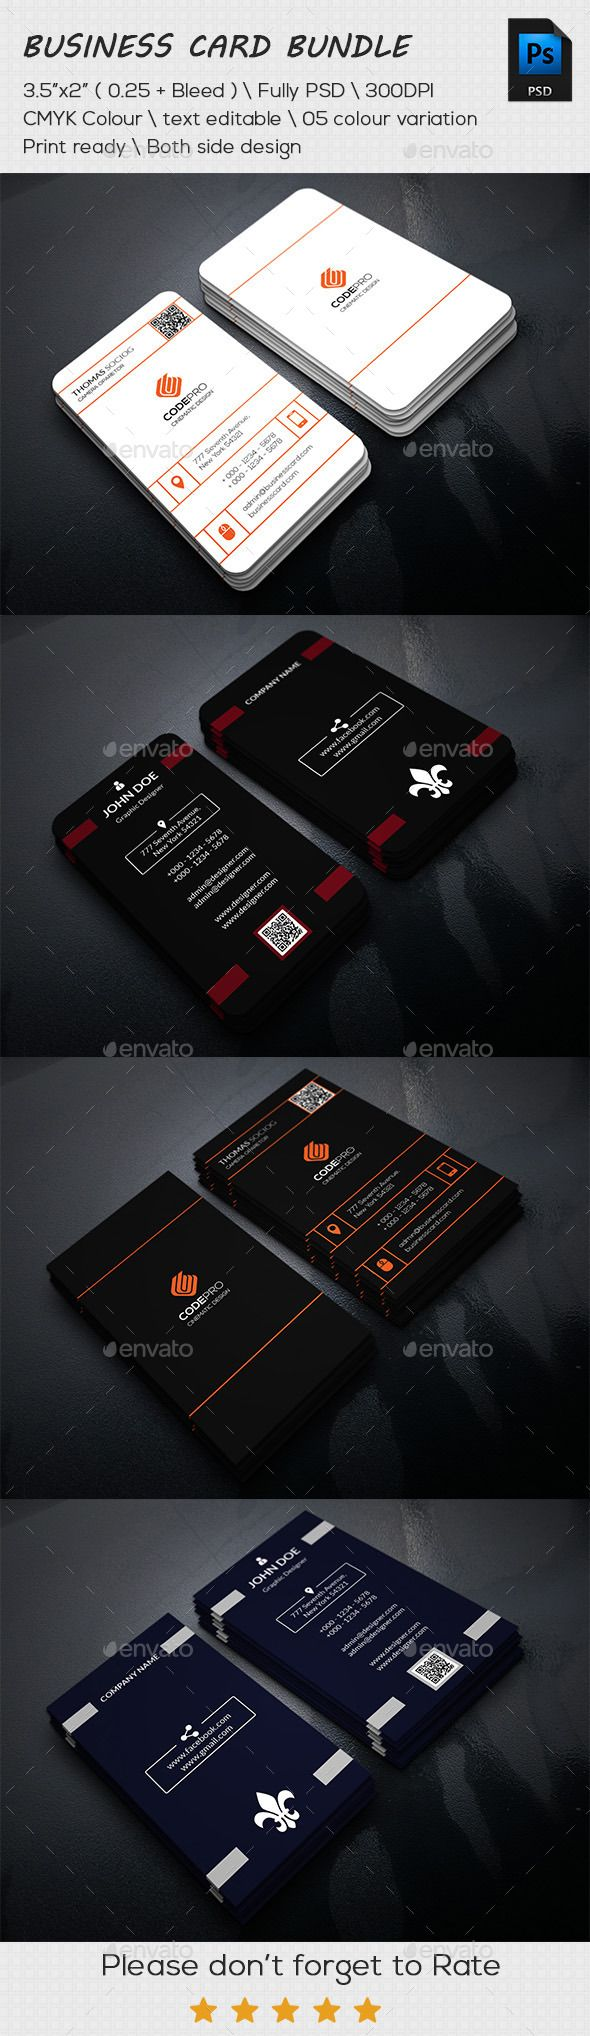 Vertical Business Card Bundle Template #design Download: http://graphicriver.net/item/vertical-business-card-bundle-/11531207?ref=ksioks